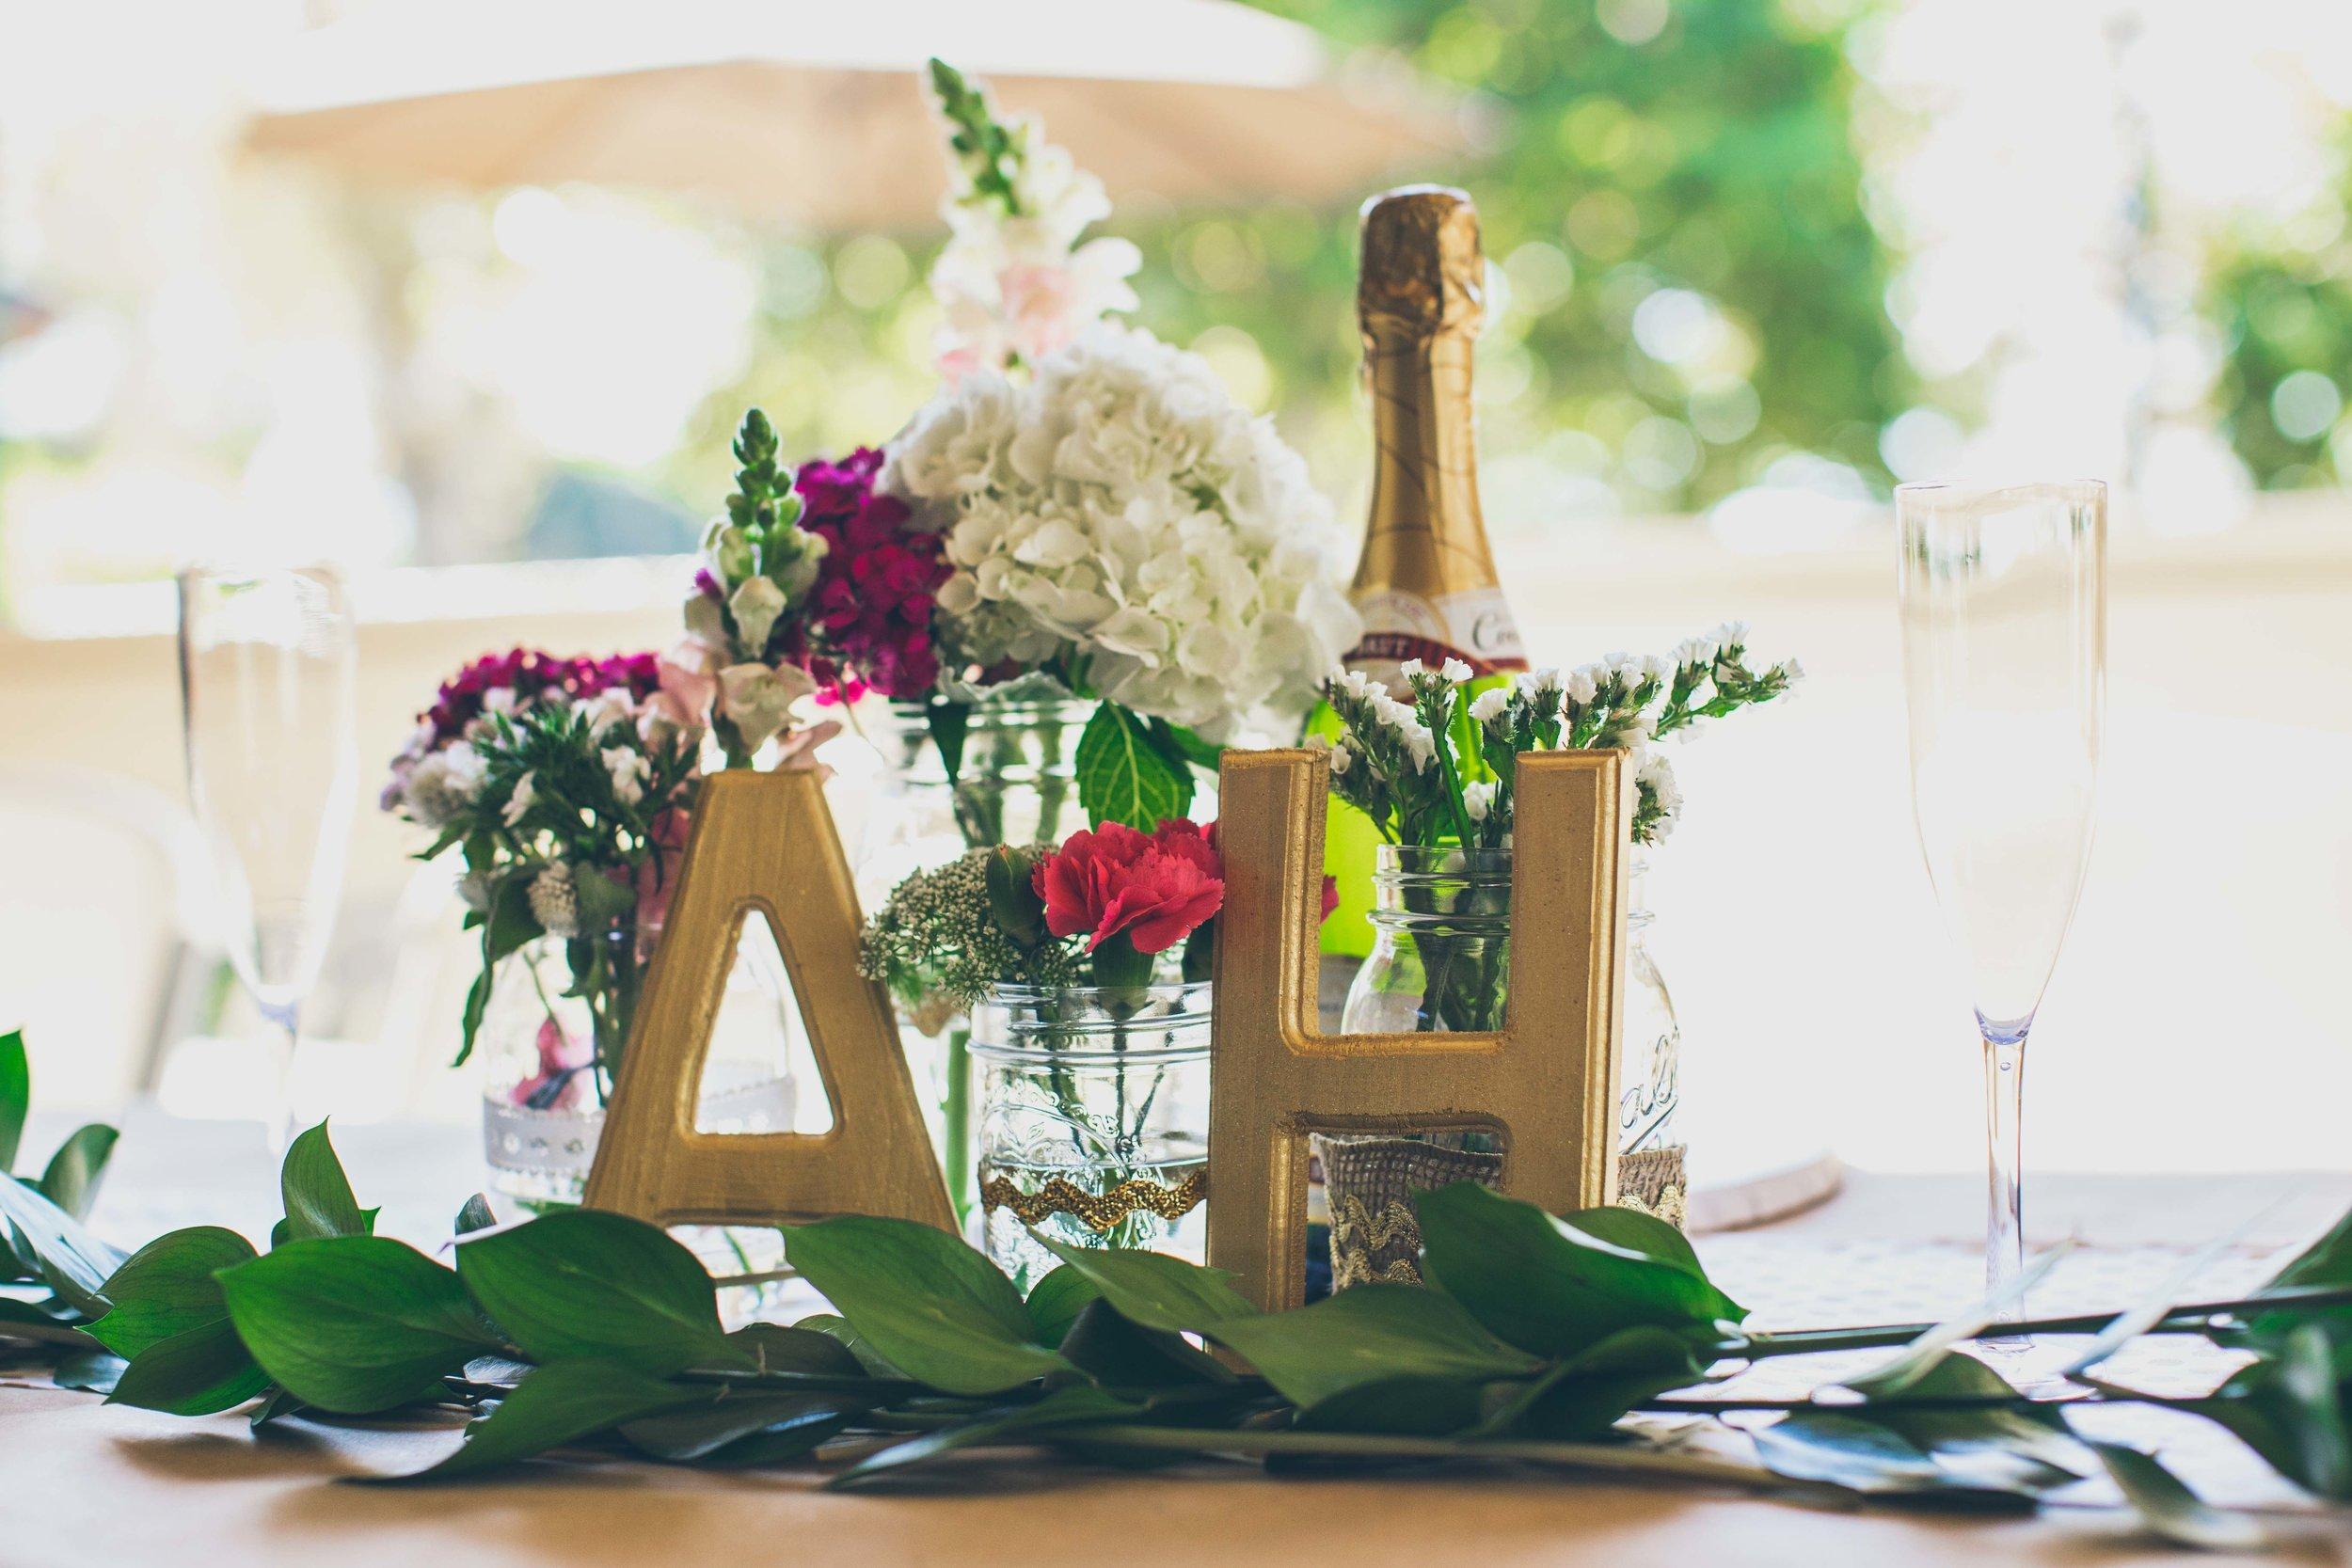 20141024-DePartee-Wedding-APavone-013-sm.jpg